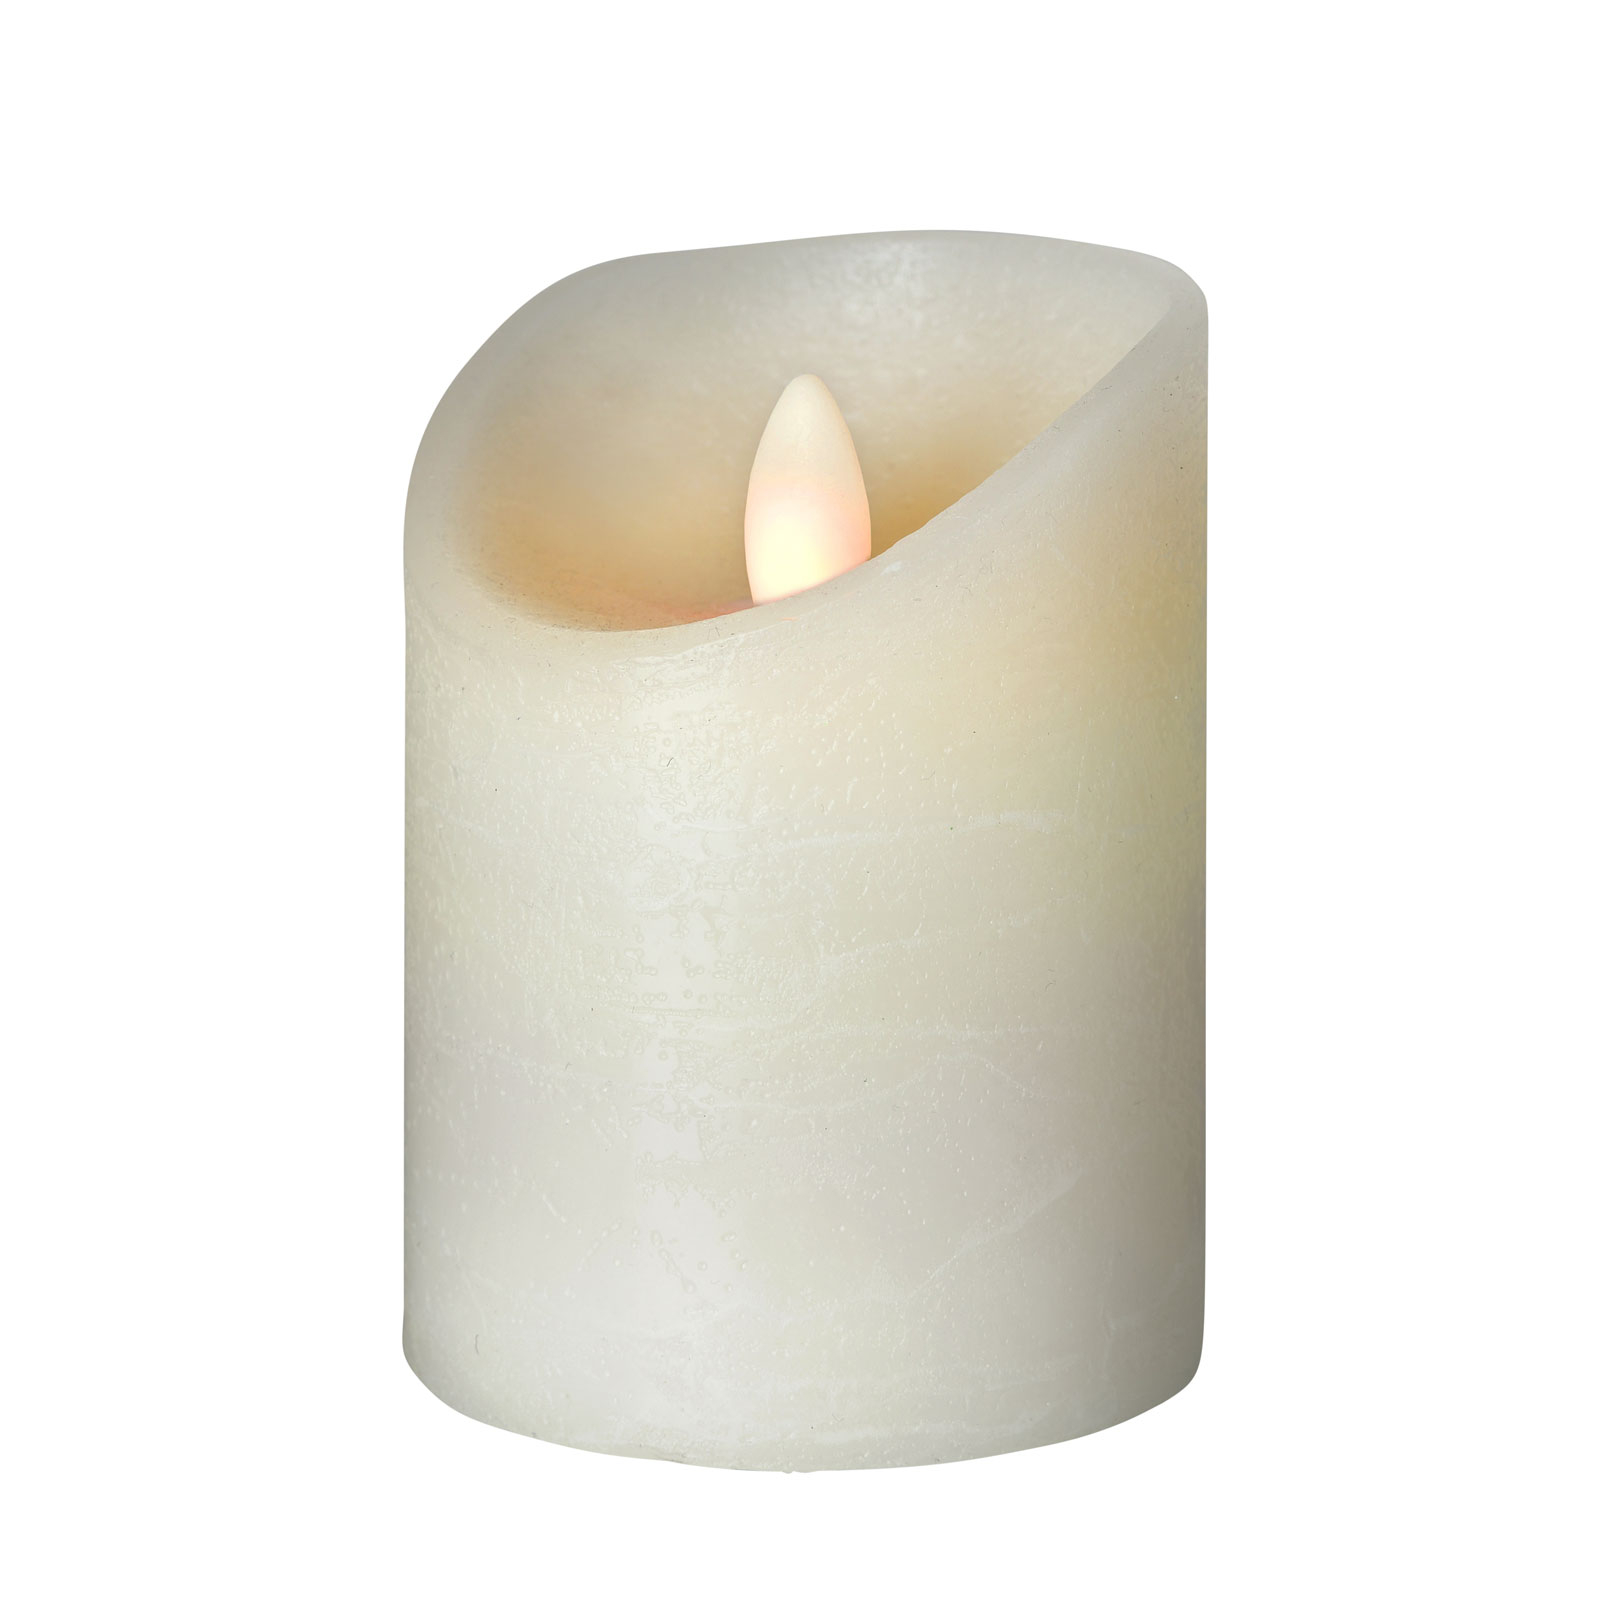 LED-Kerze Shine, Ø 7,5 cm, elfenbein, Höhe 12,5cm